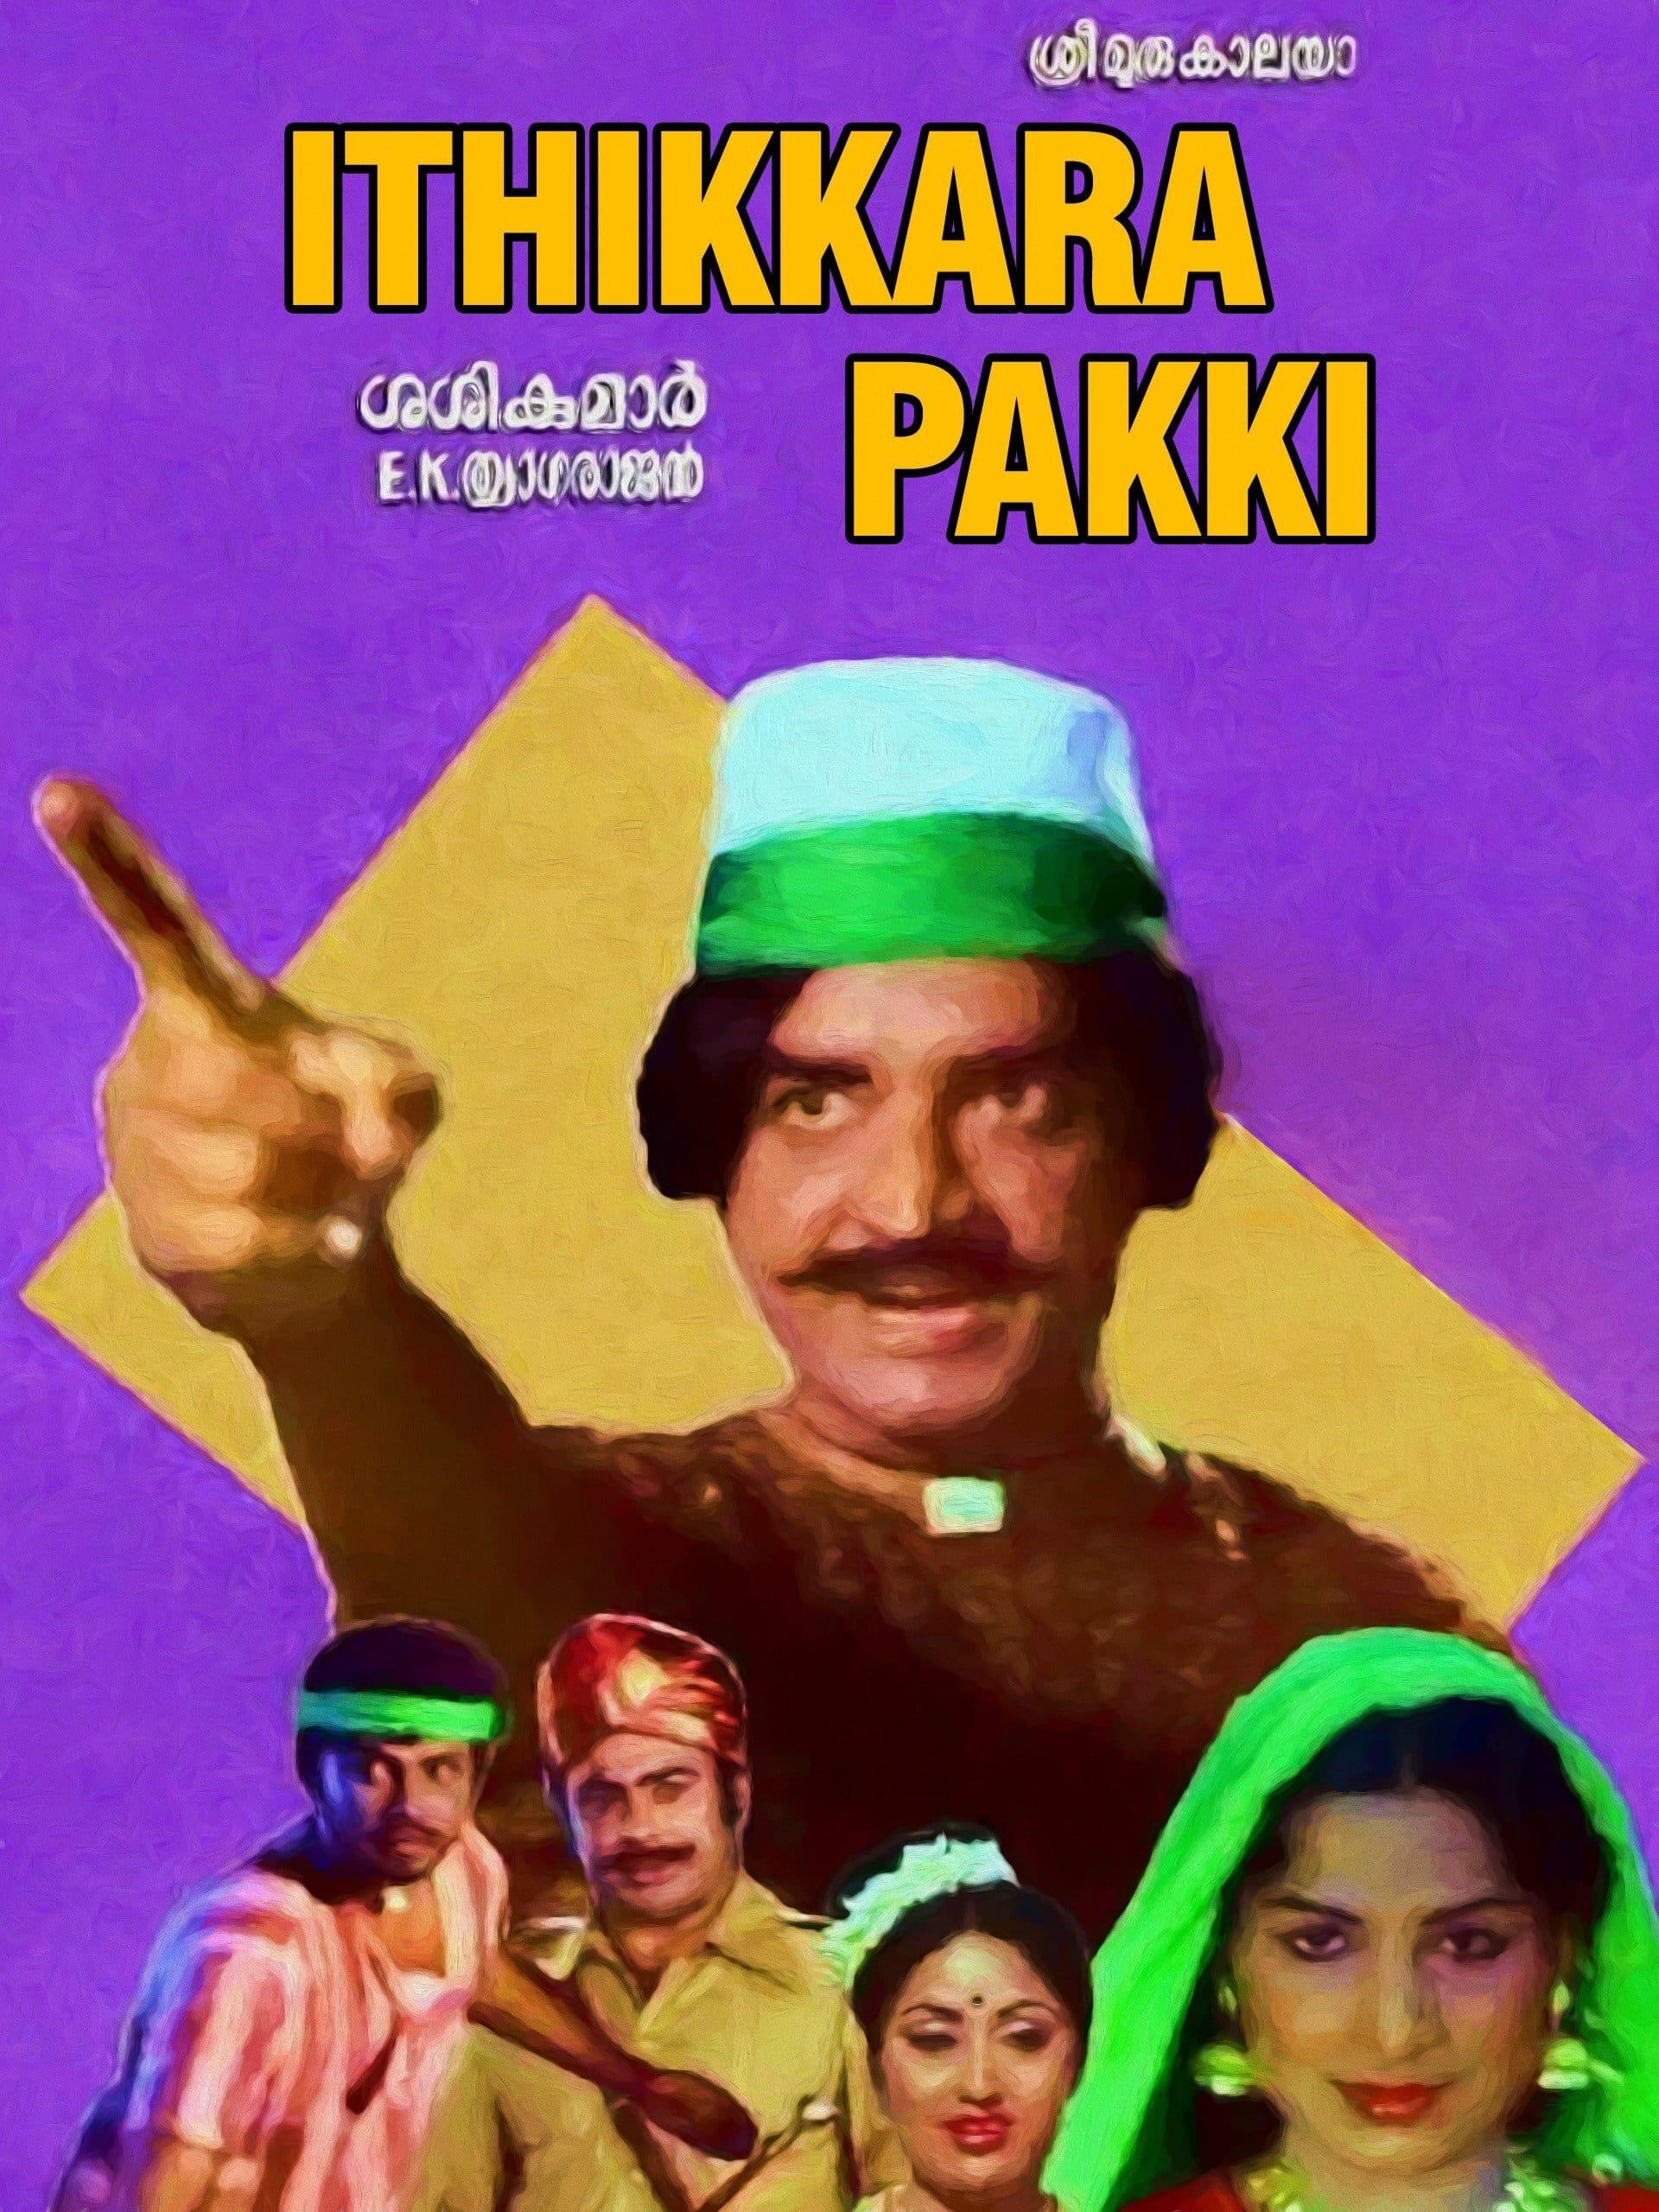 Ithikkara Pakky